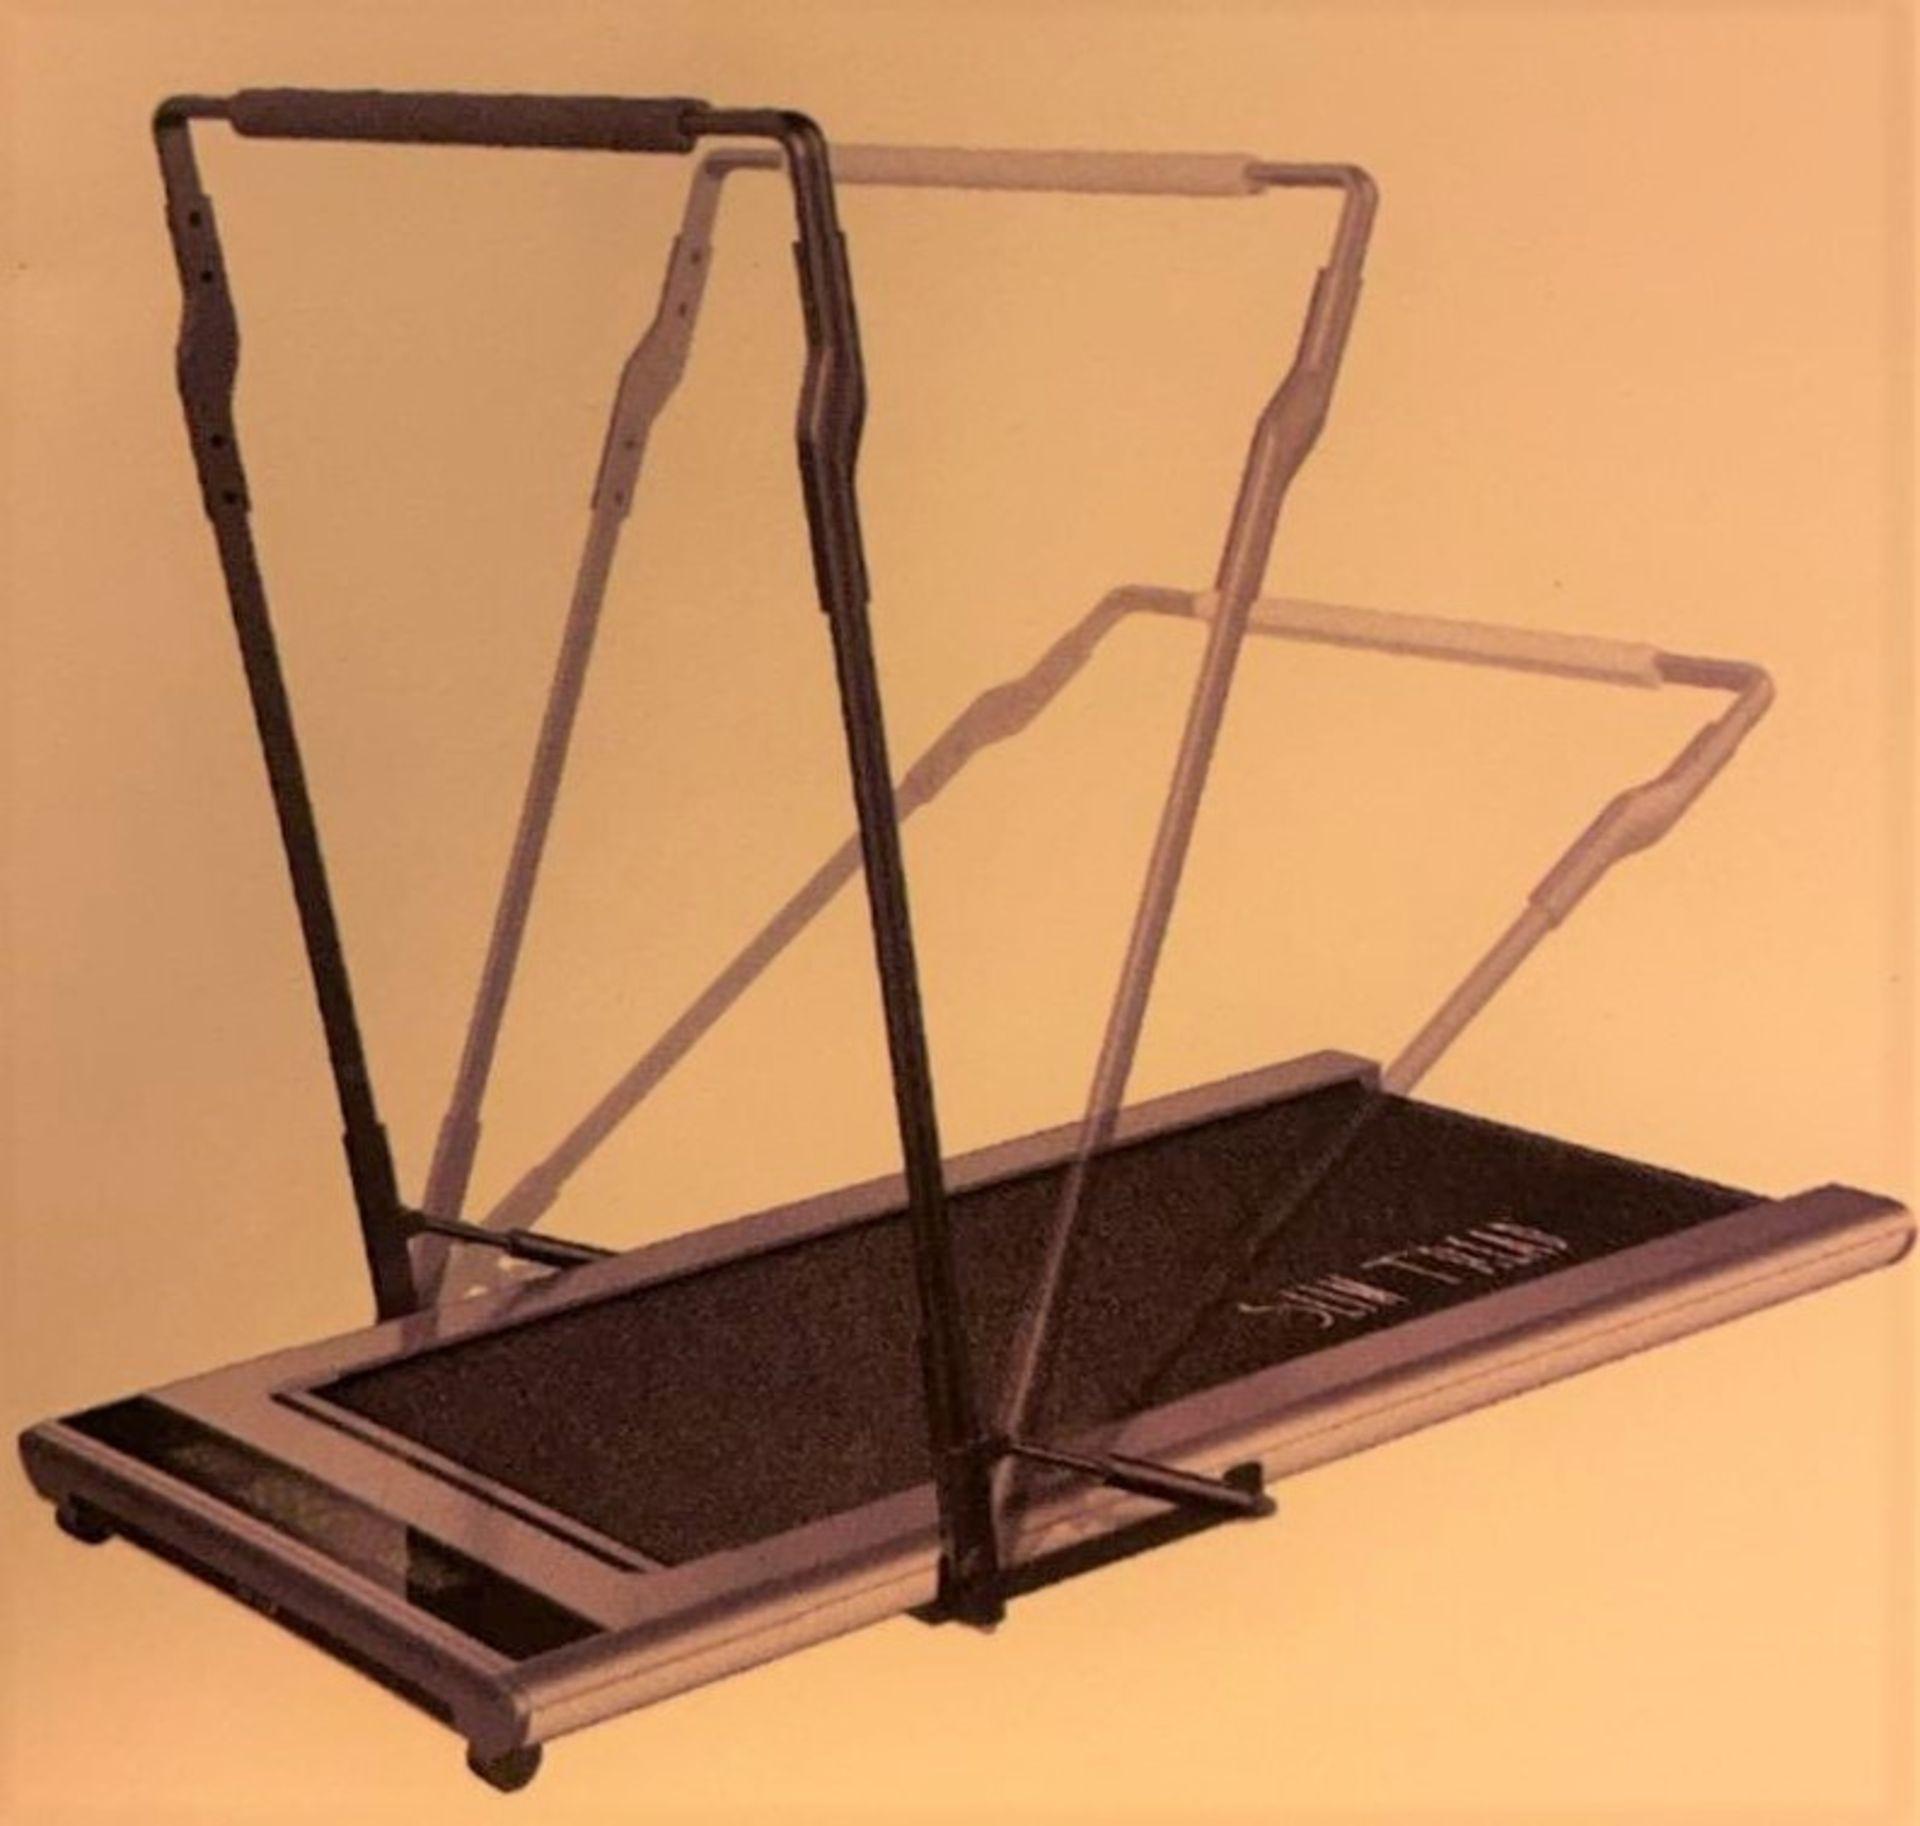 1 x Slim Tread Ultra Thin Smart Treadmill Running / Walking Machine - Lightweight With Folding - Image 13 of 23